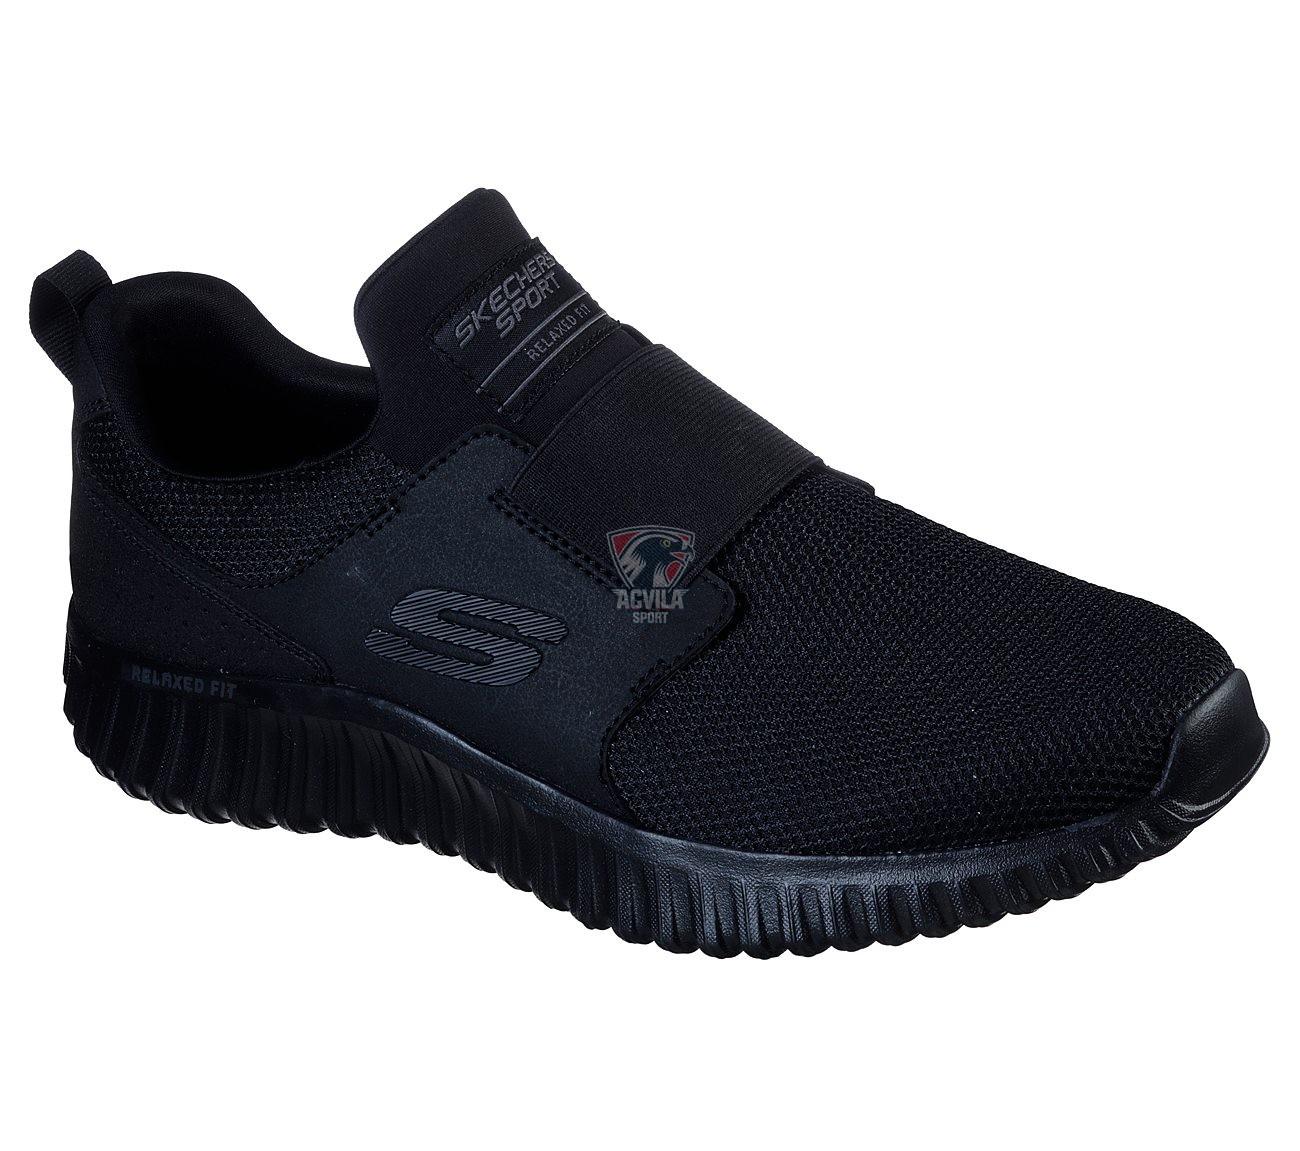 photo 0 Спортивная обувь SKECHERS DEPTH CHARGE